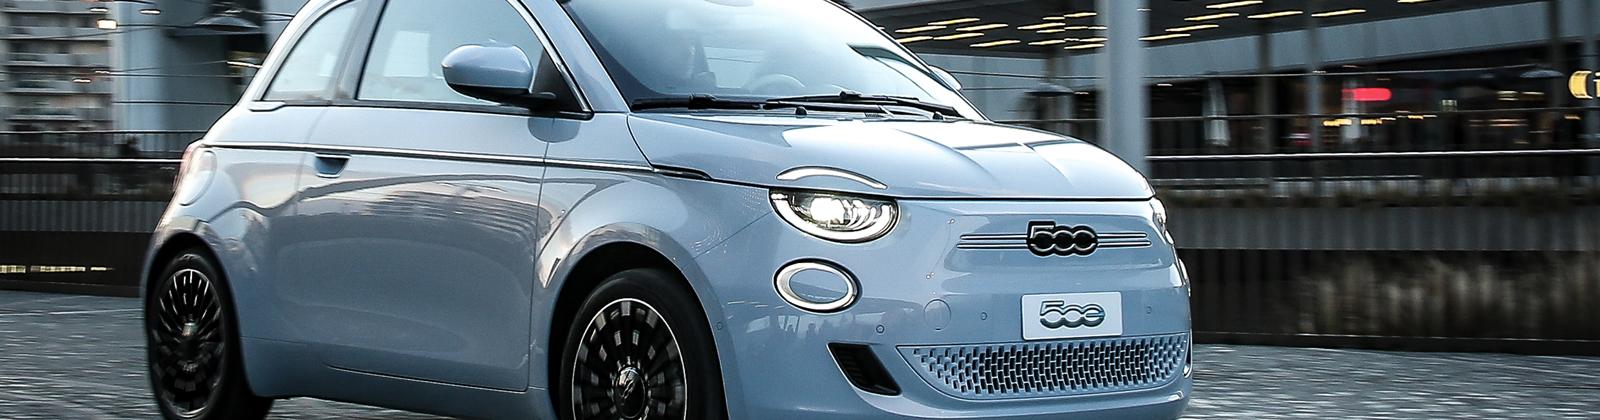 Fiat 500e: Exclusieve La Prima versie nu al te bestellen